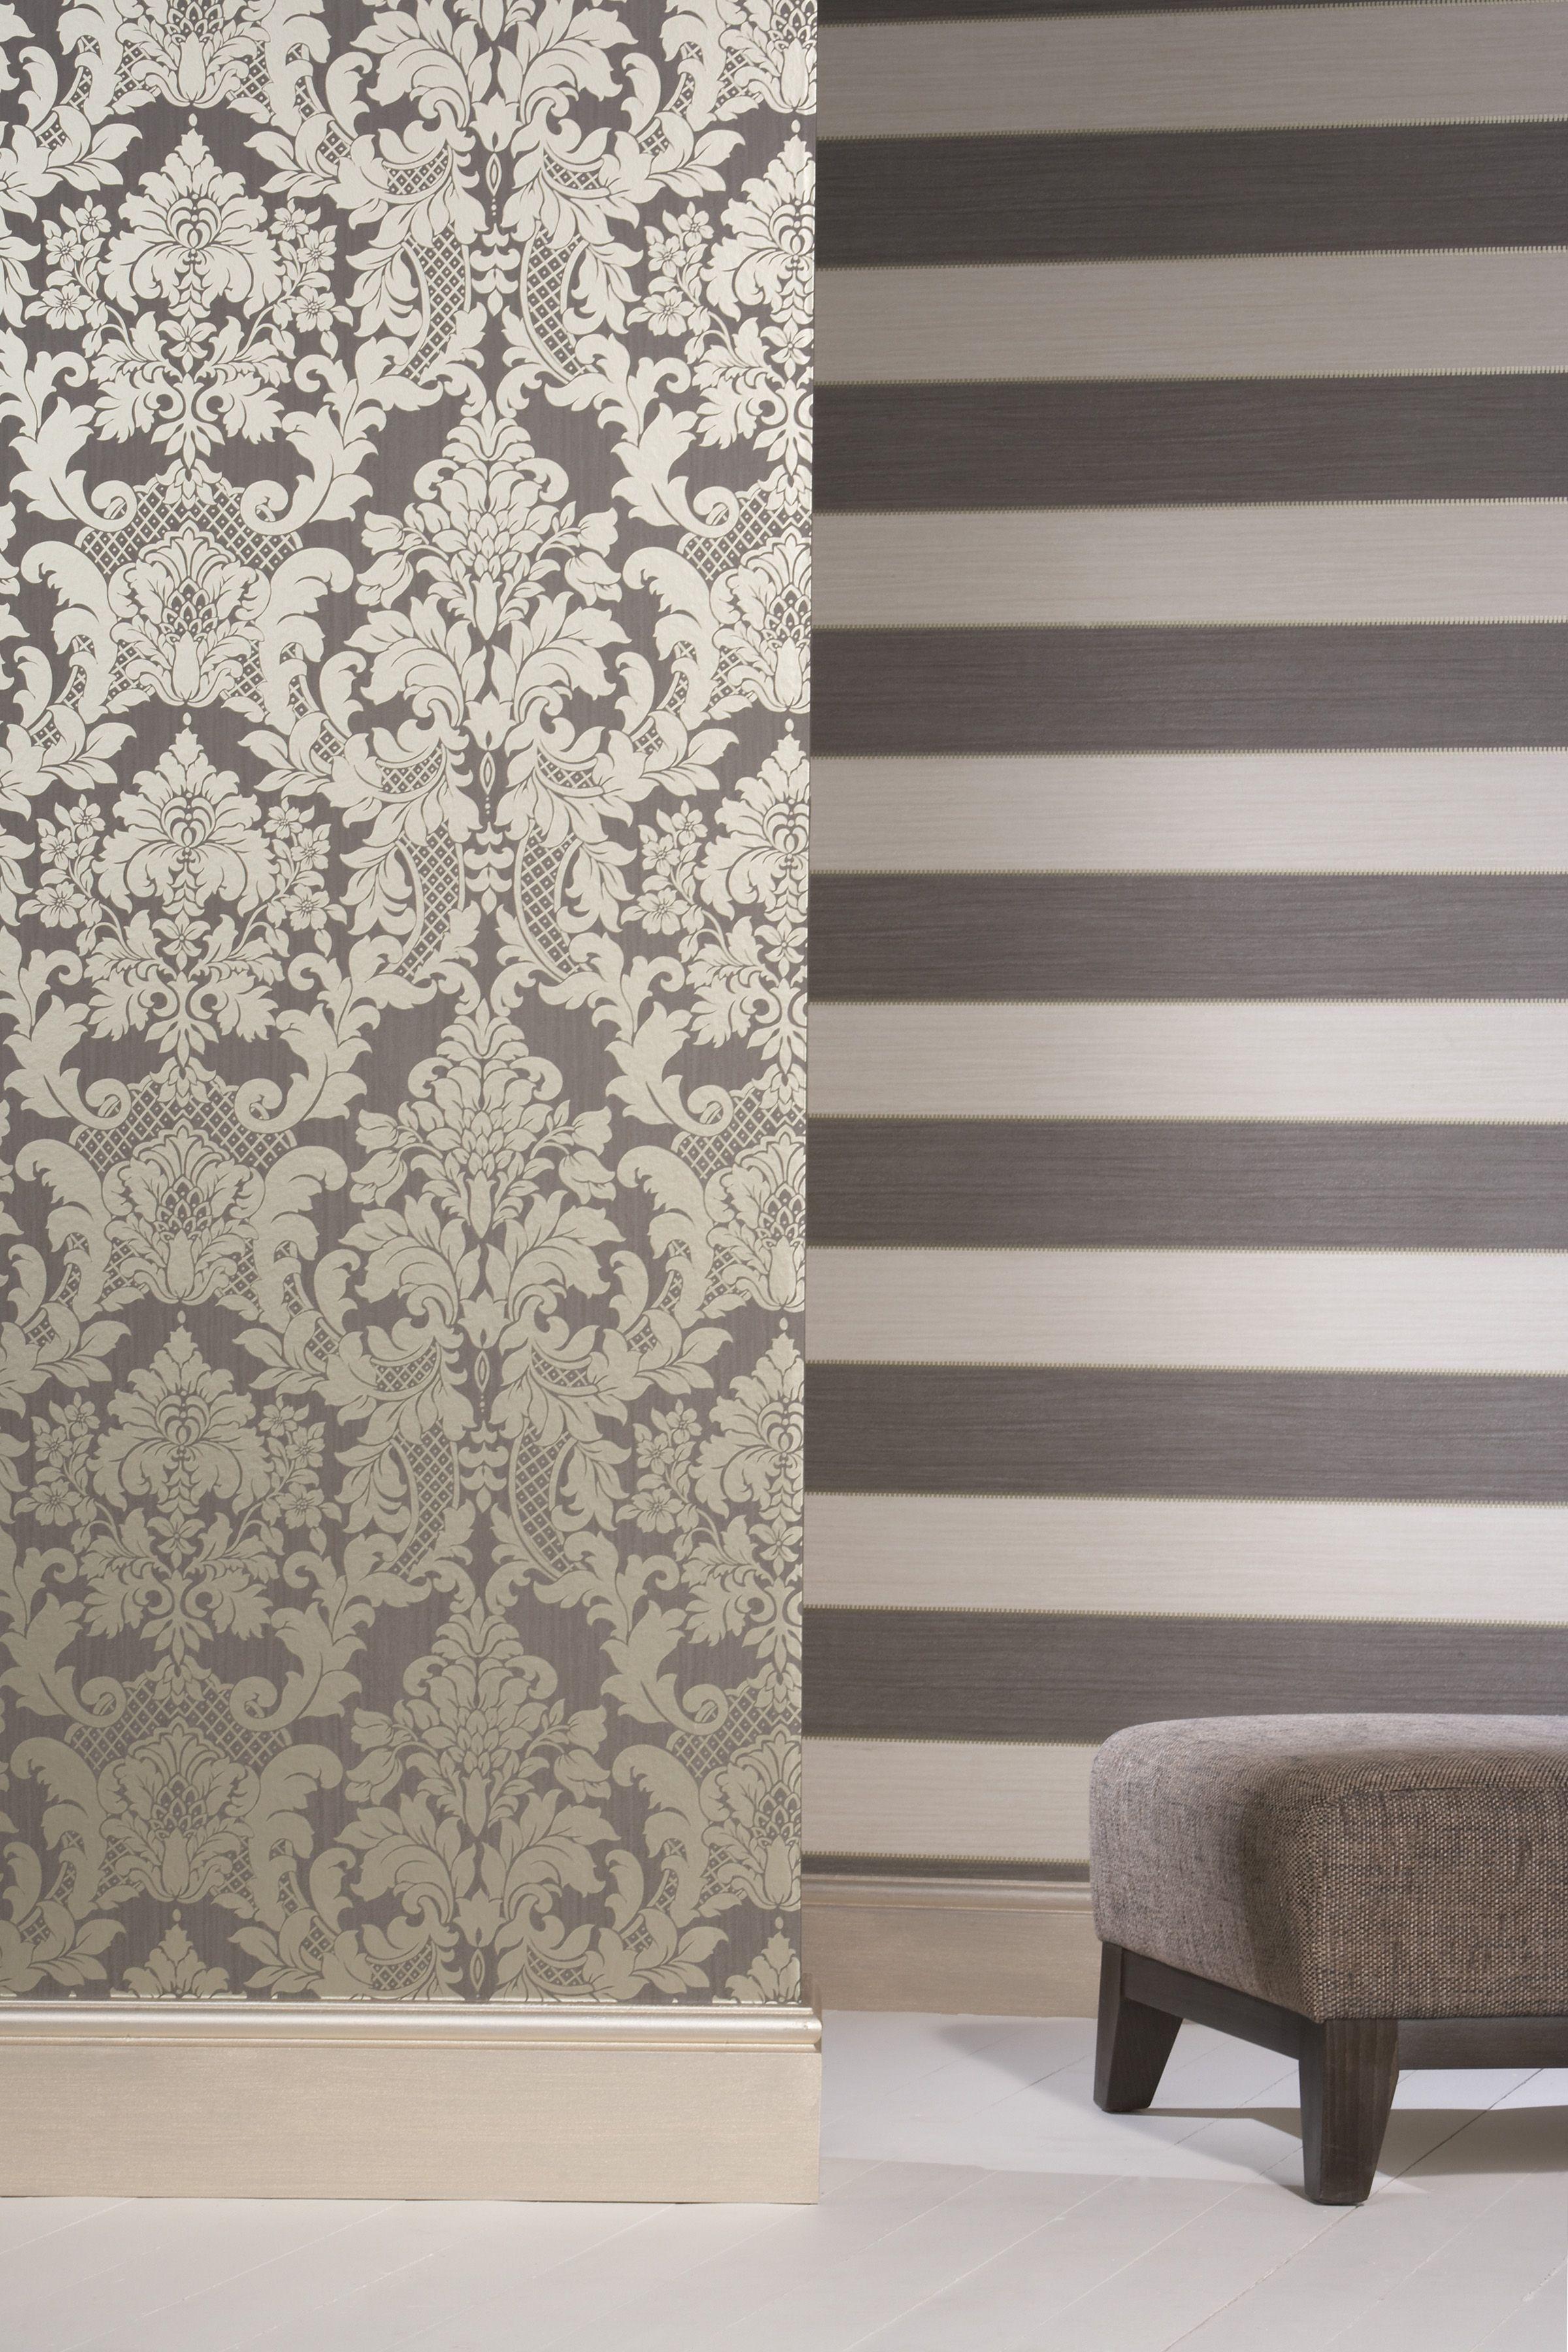 Berkeley Damask And Striped Wallpaper A1 Spongeable Wallpaper